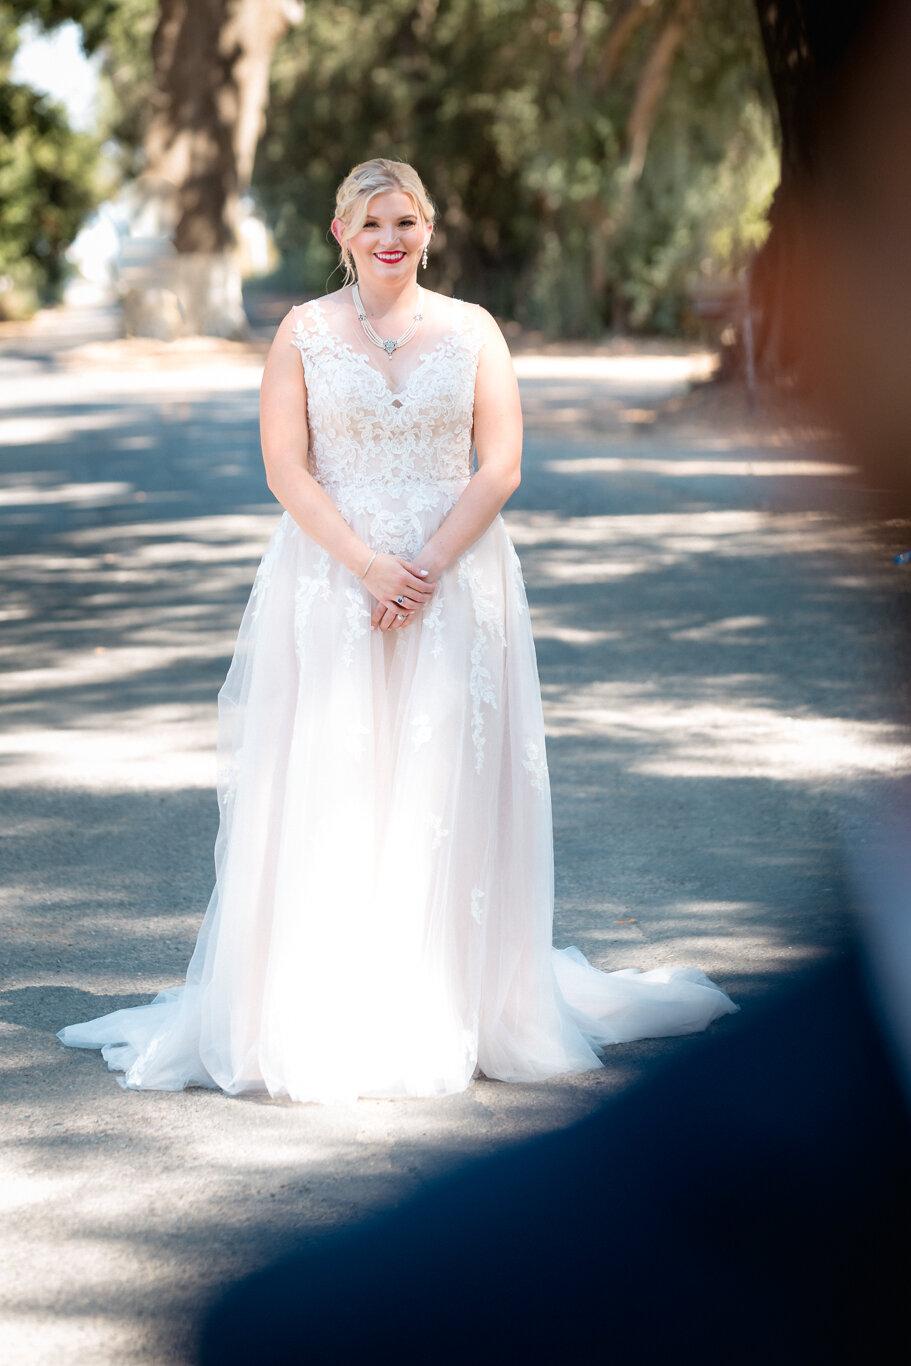 2019.08.24_Emily-Ashir-Wedding-at-the-Maples-5243.jpg